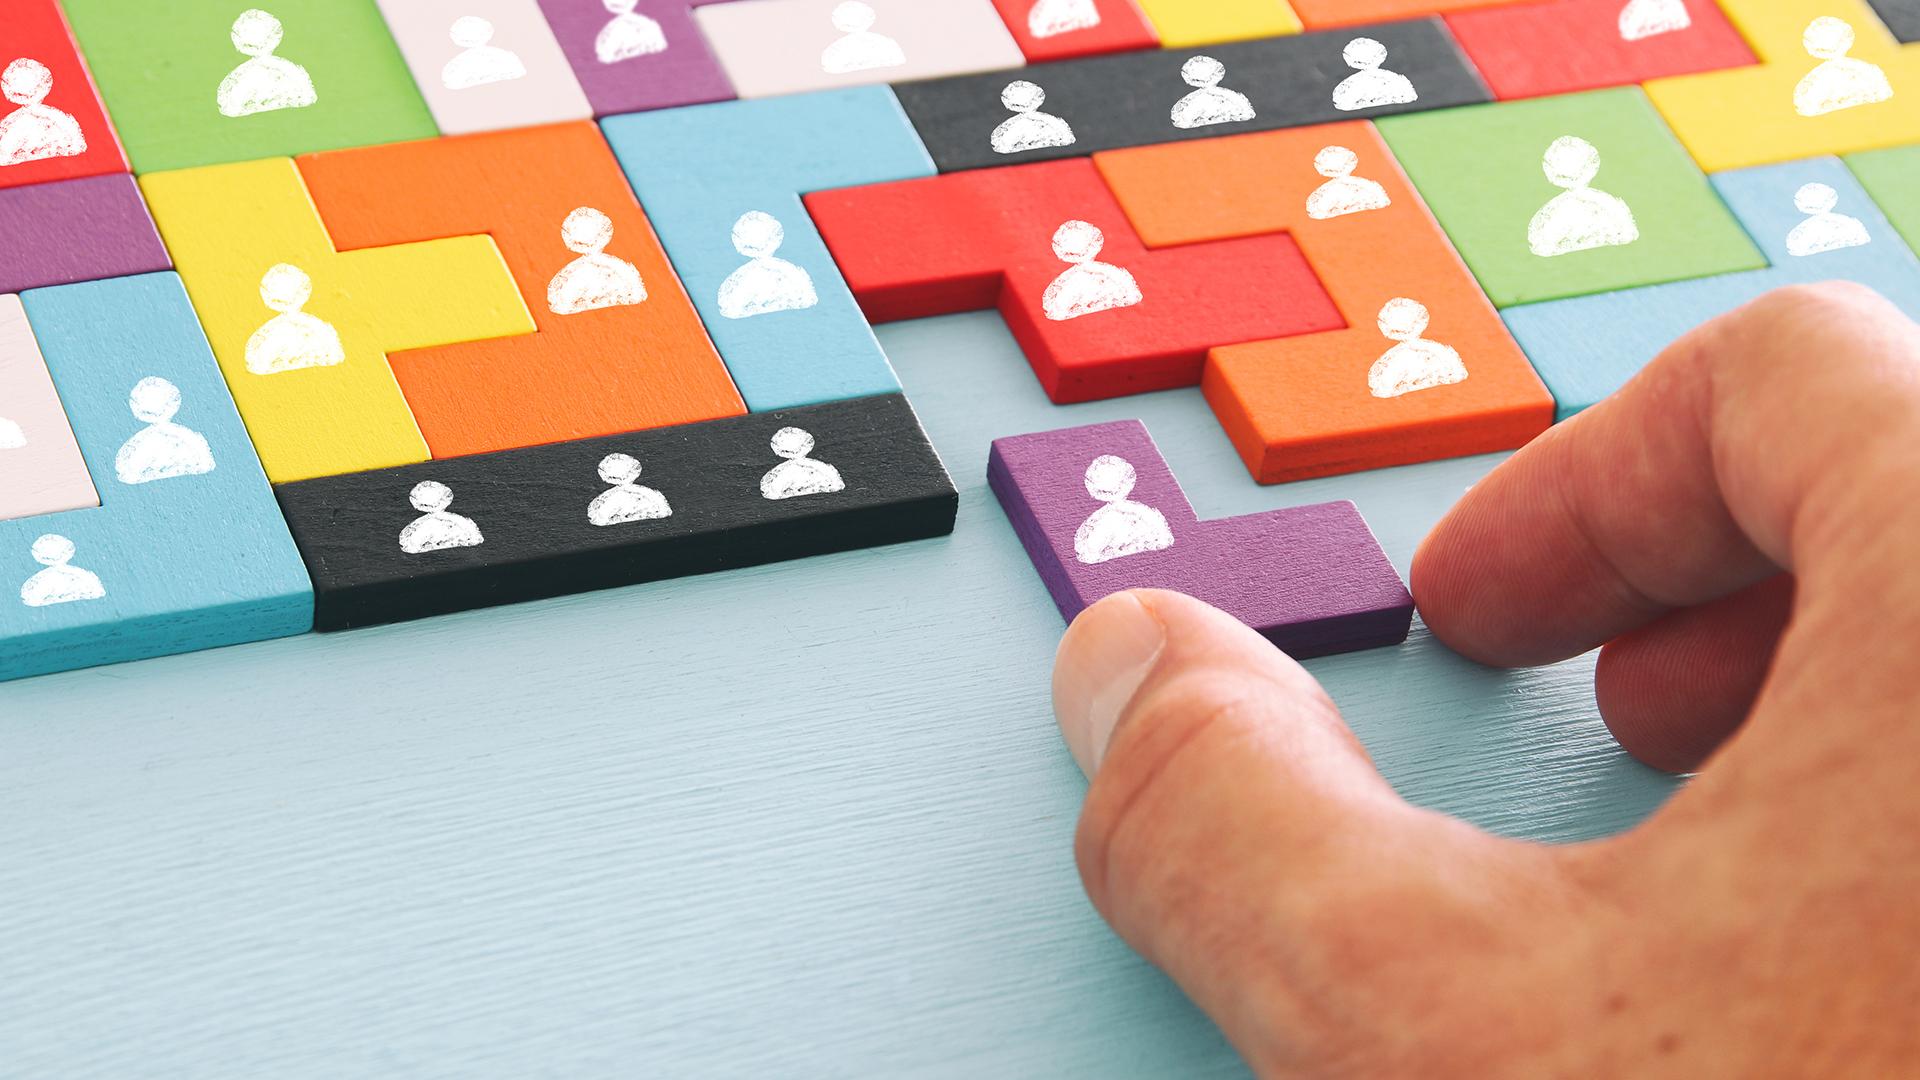 Employement-labour-people-resources-puzzle-management-unity